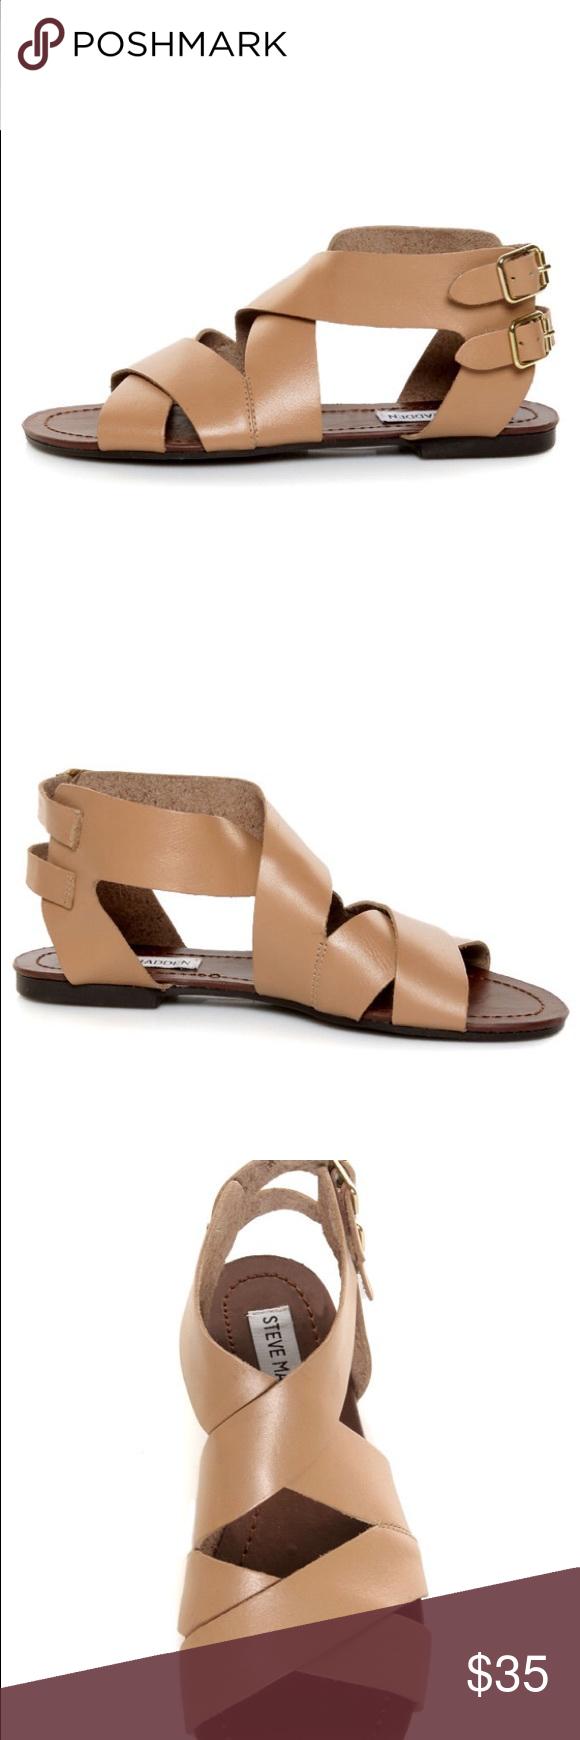 Steve Madden Gladiator Sandals Worn one time. Size 9. Will ship next day  Steve